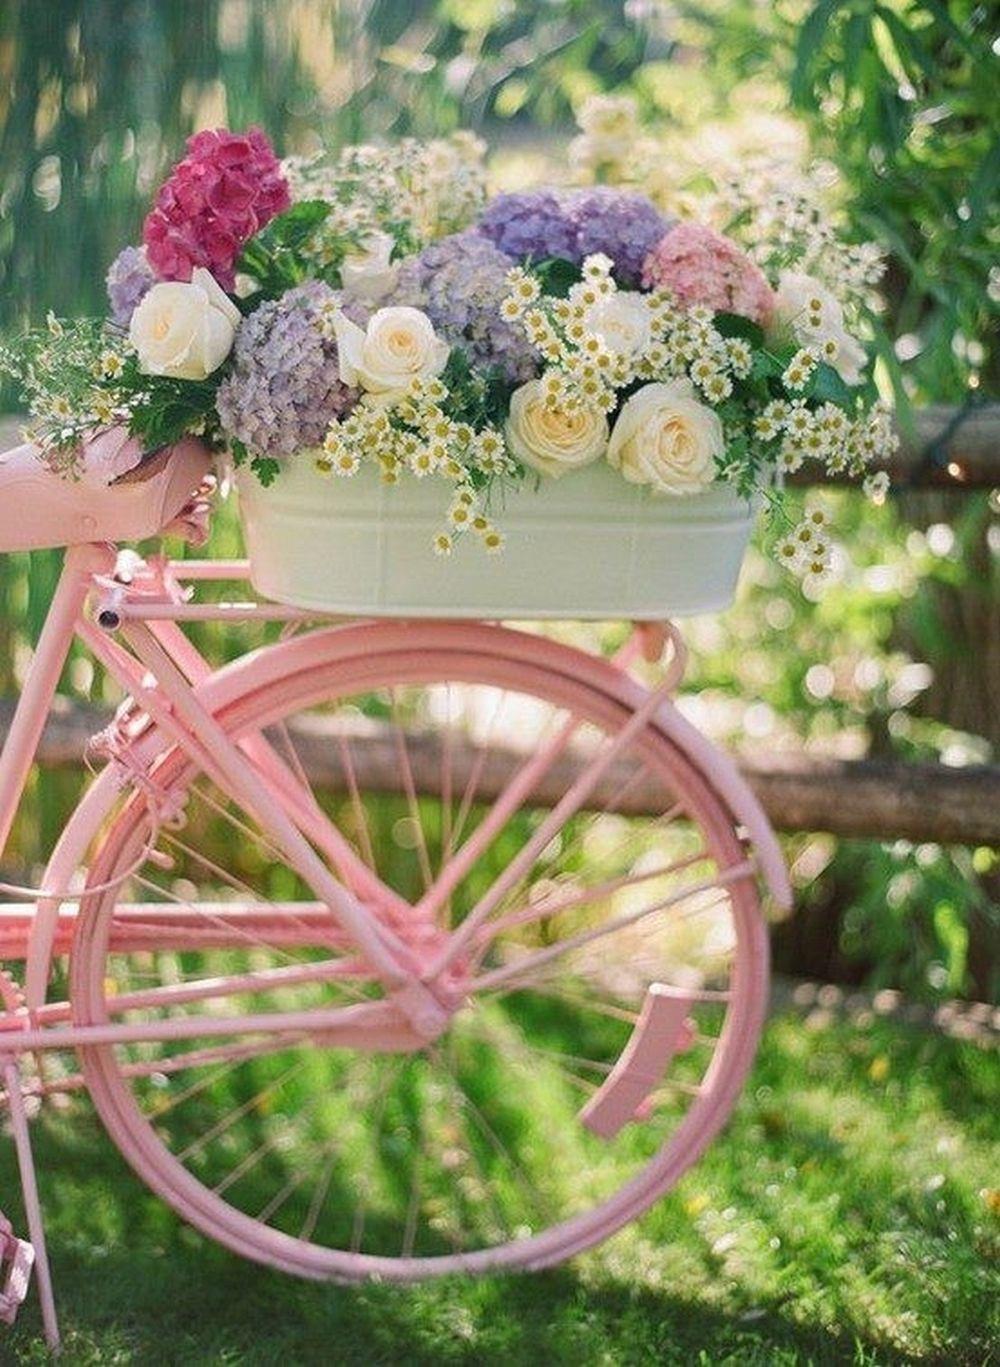 Épinglé Par Jo Wilde Sur Beautiful Bikes Pleasure On 2 ... destiné Velo Deco Jardin